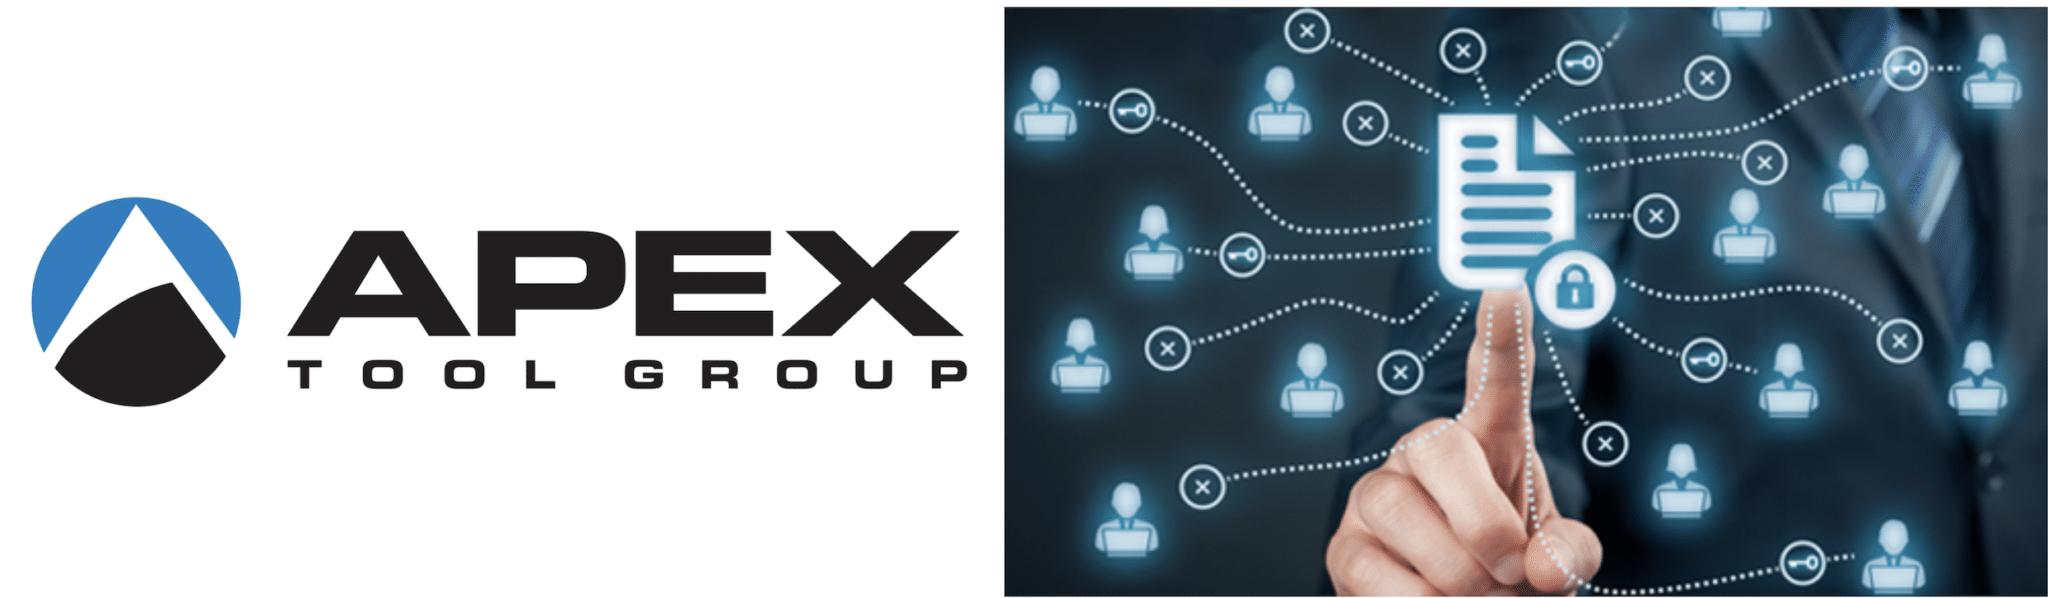 Apex Tool Group Image